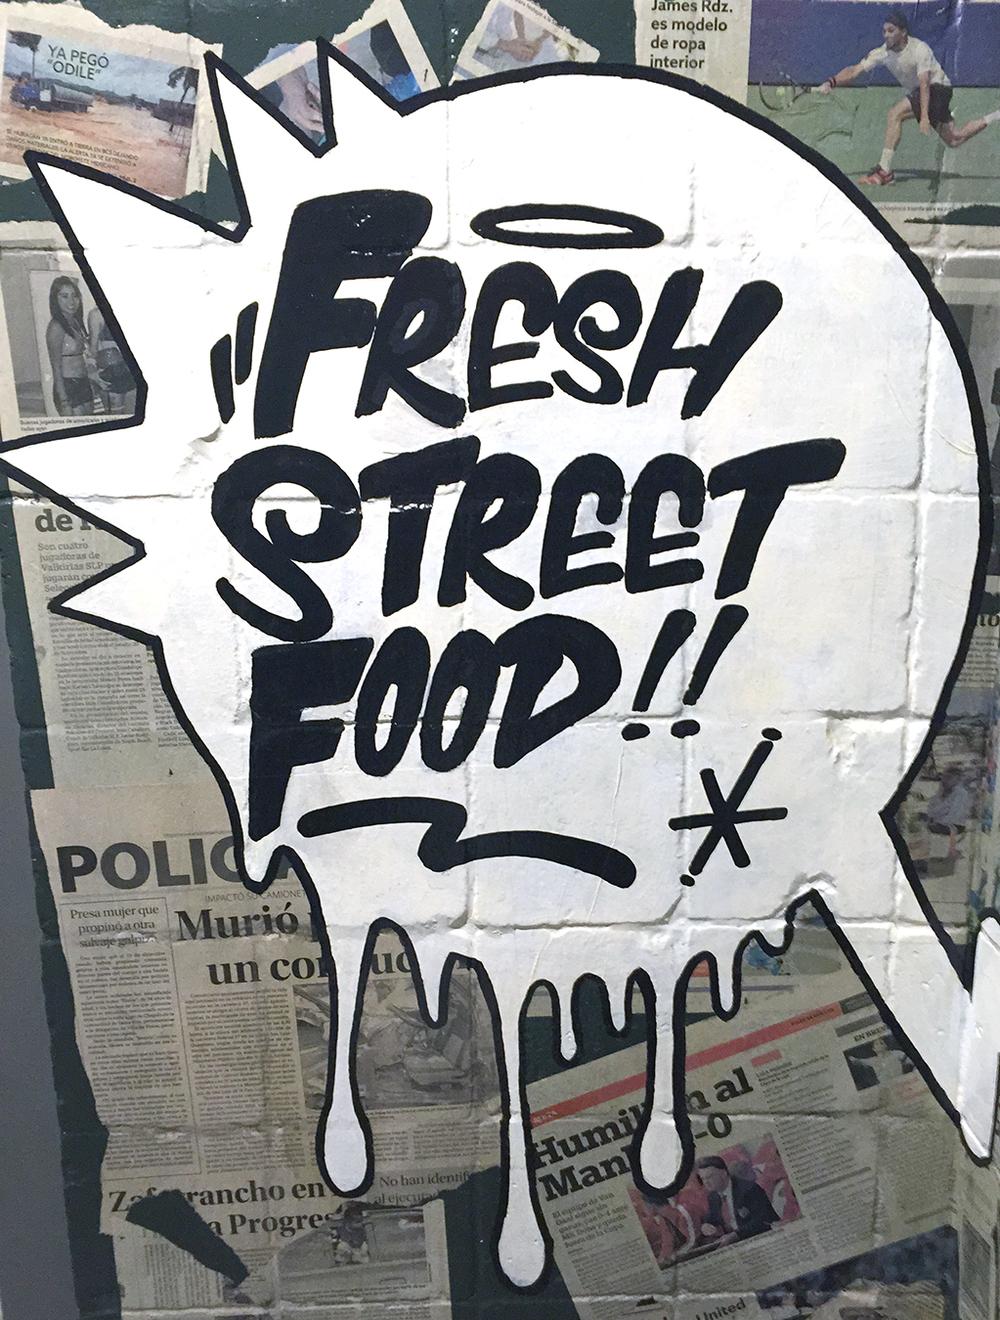 freshstreetfood.jpg